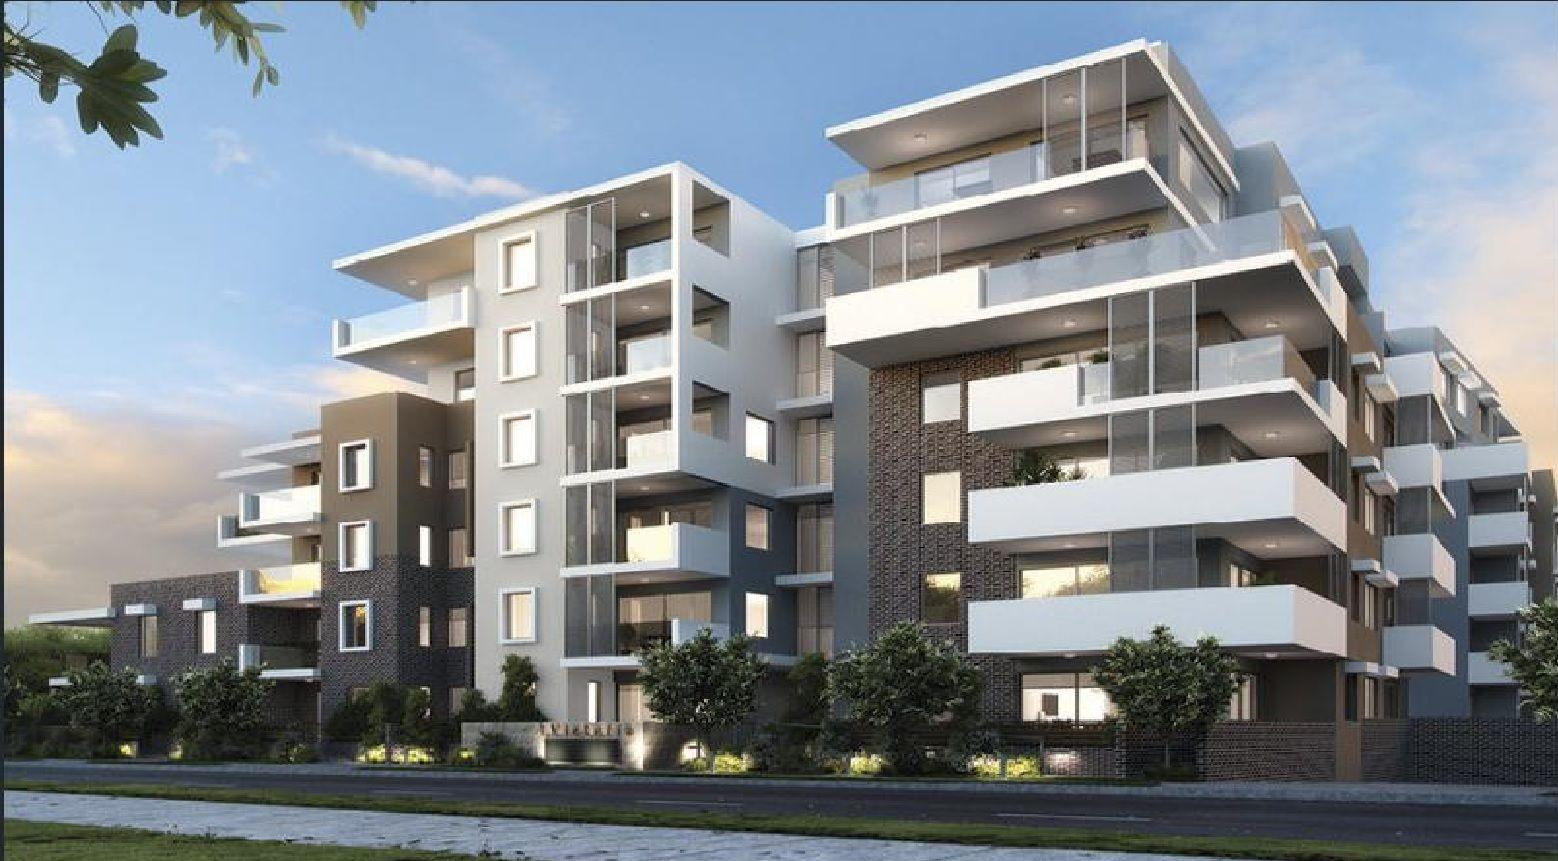 206/1-7 Victoria St, Ashfield NSW 2131, Image 0